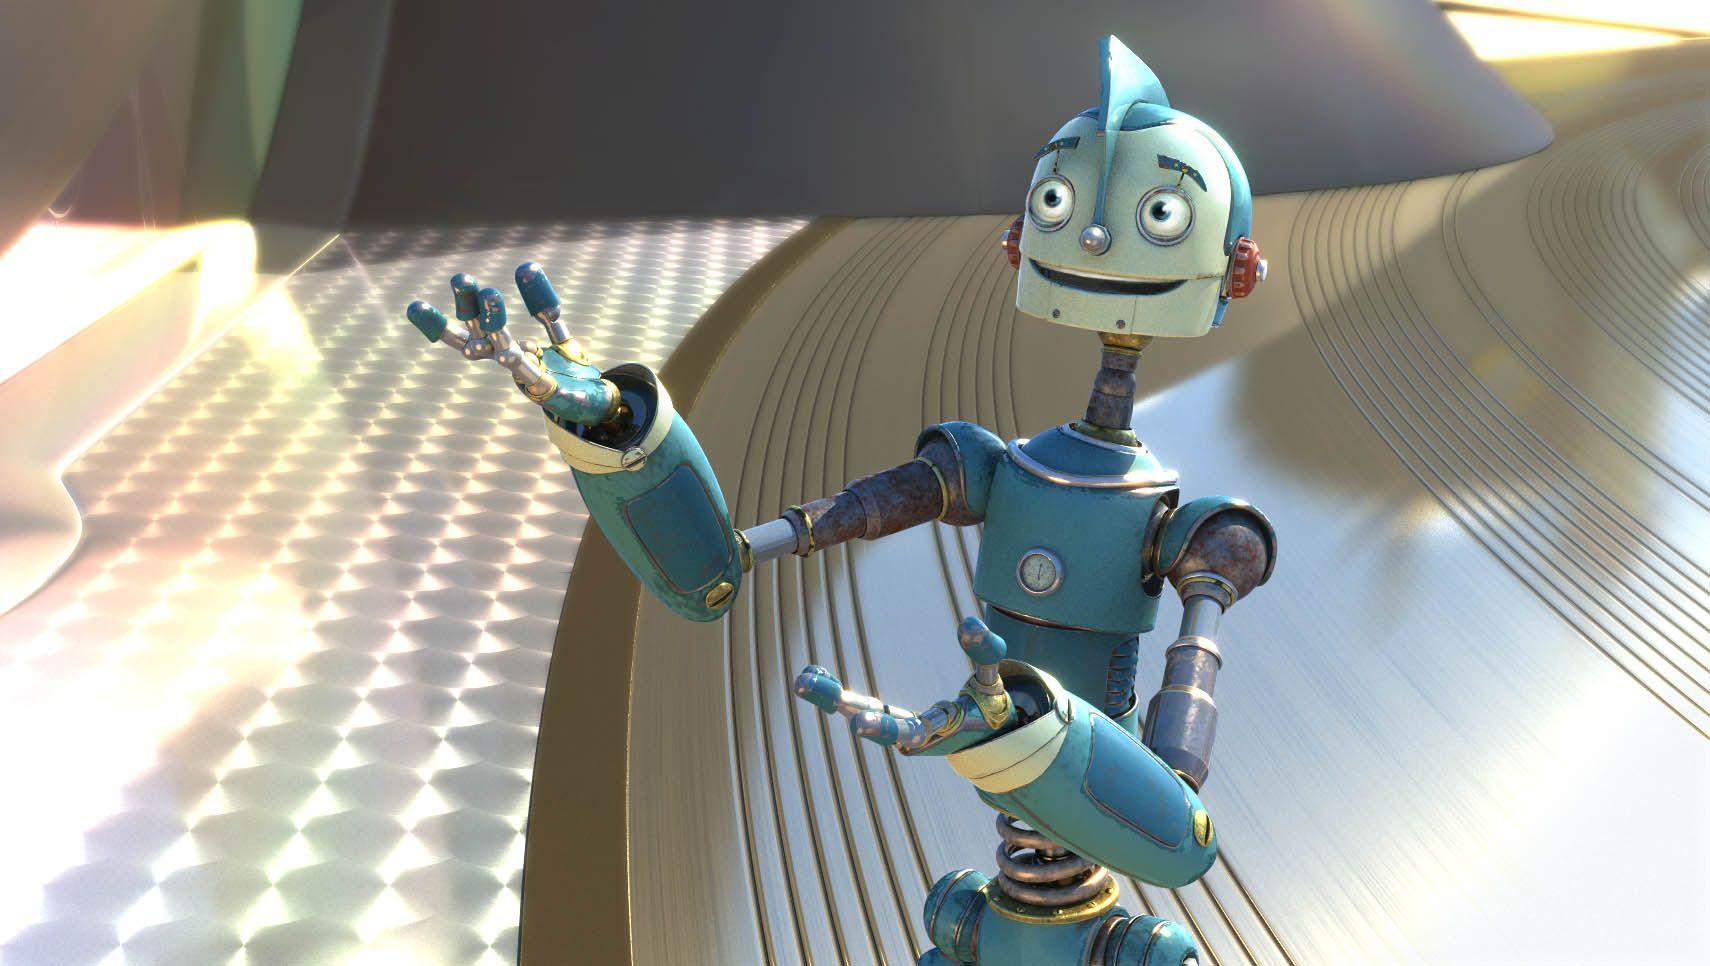 Робот из мультика картинки